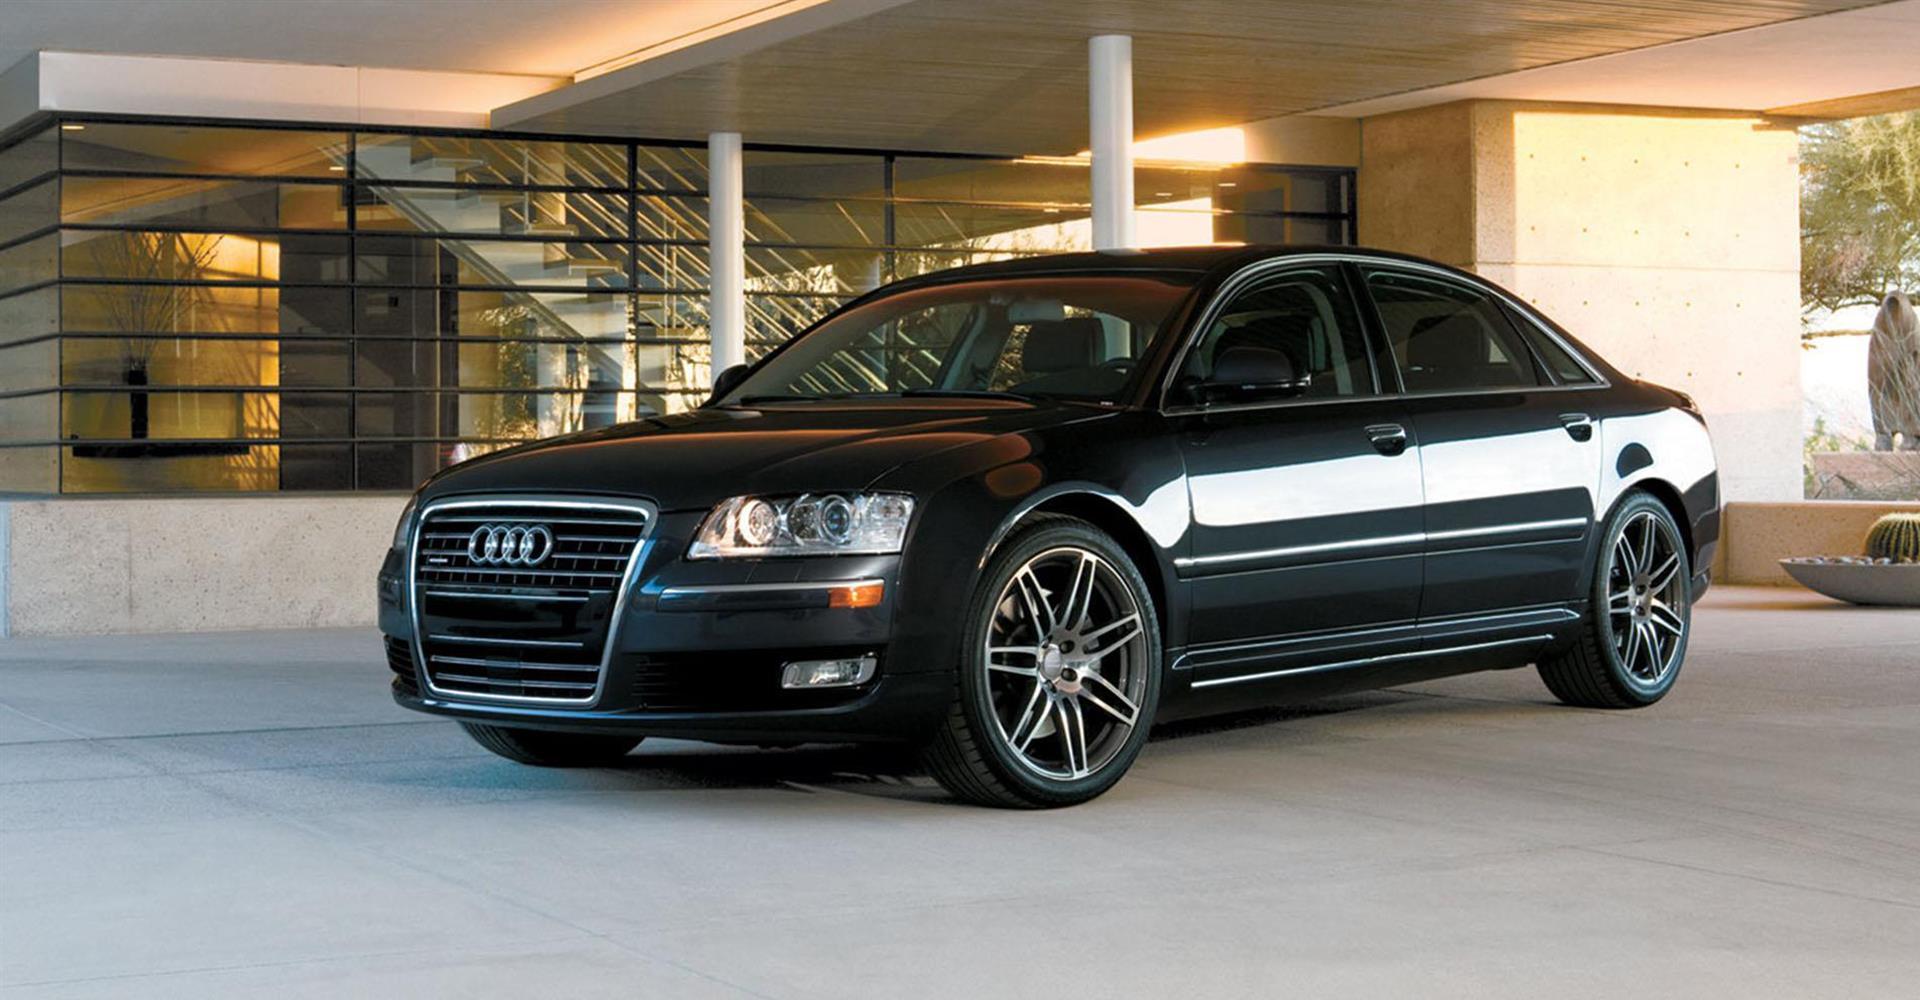 Integrity Auto Sales Sacramento Ca New Used Cars